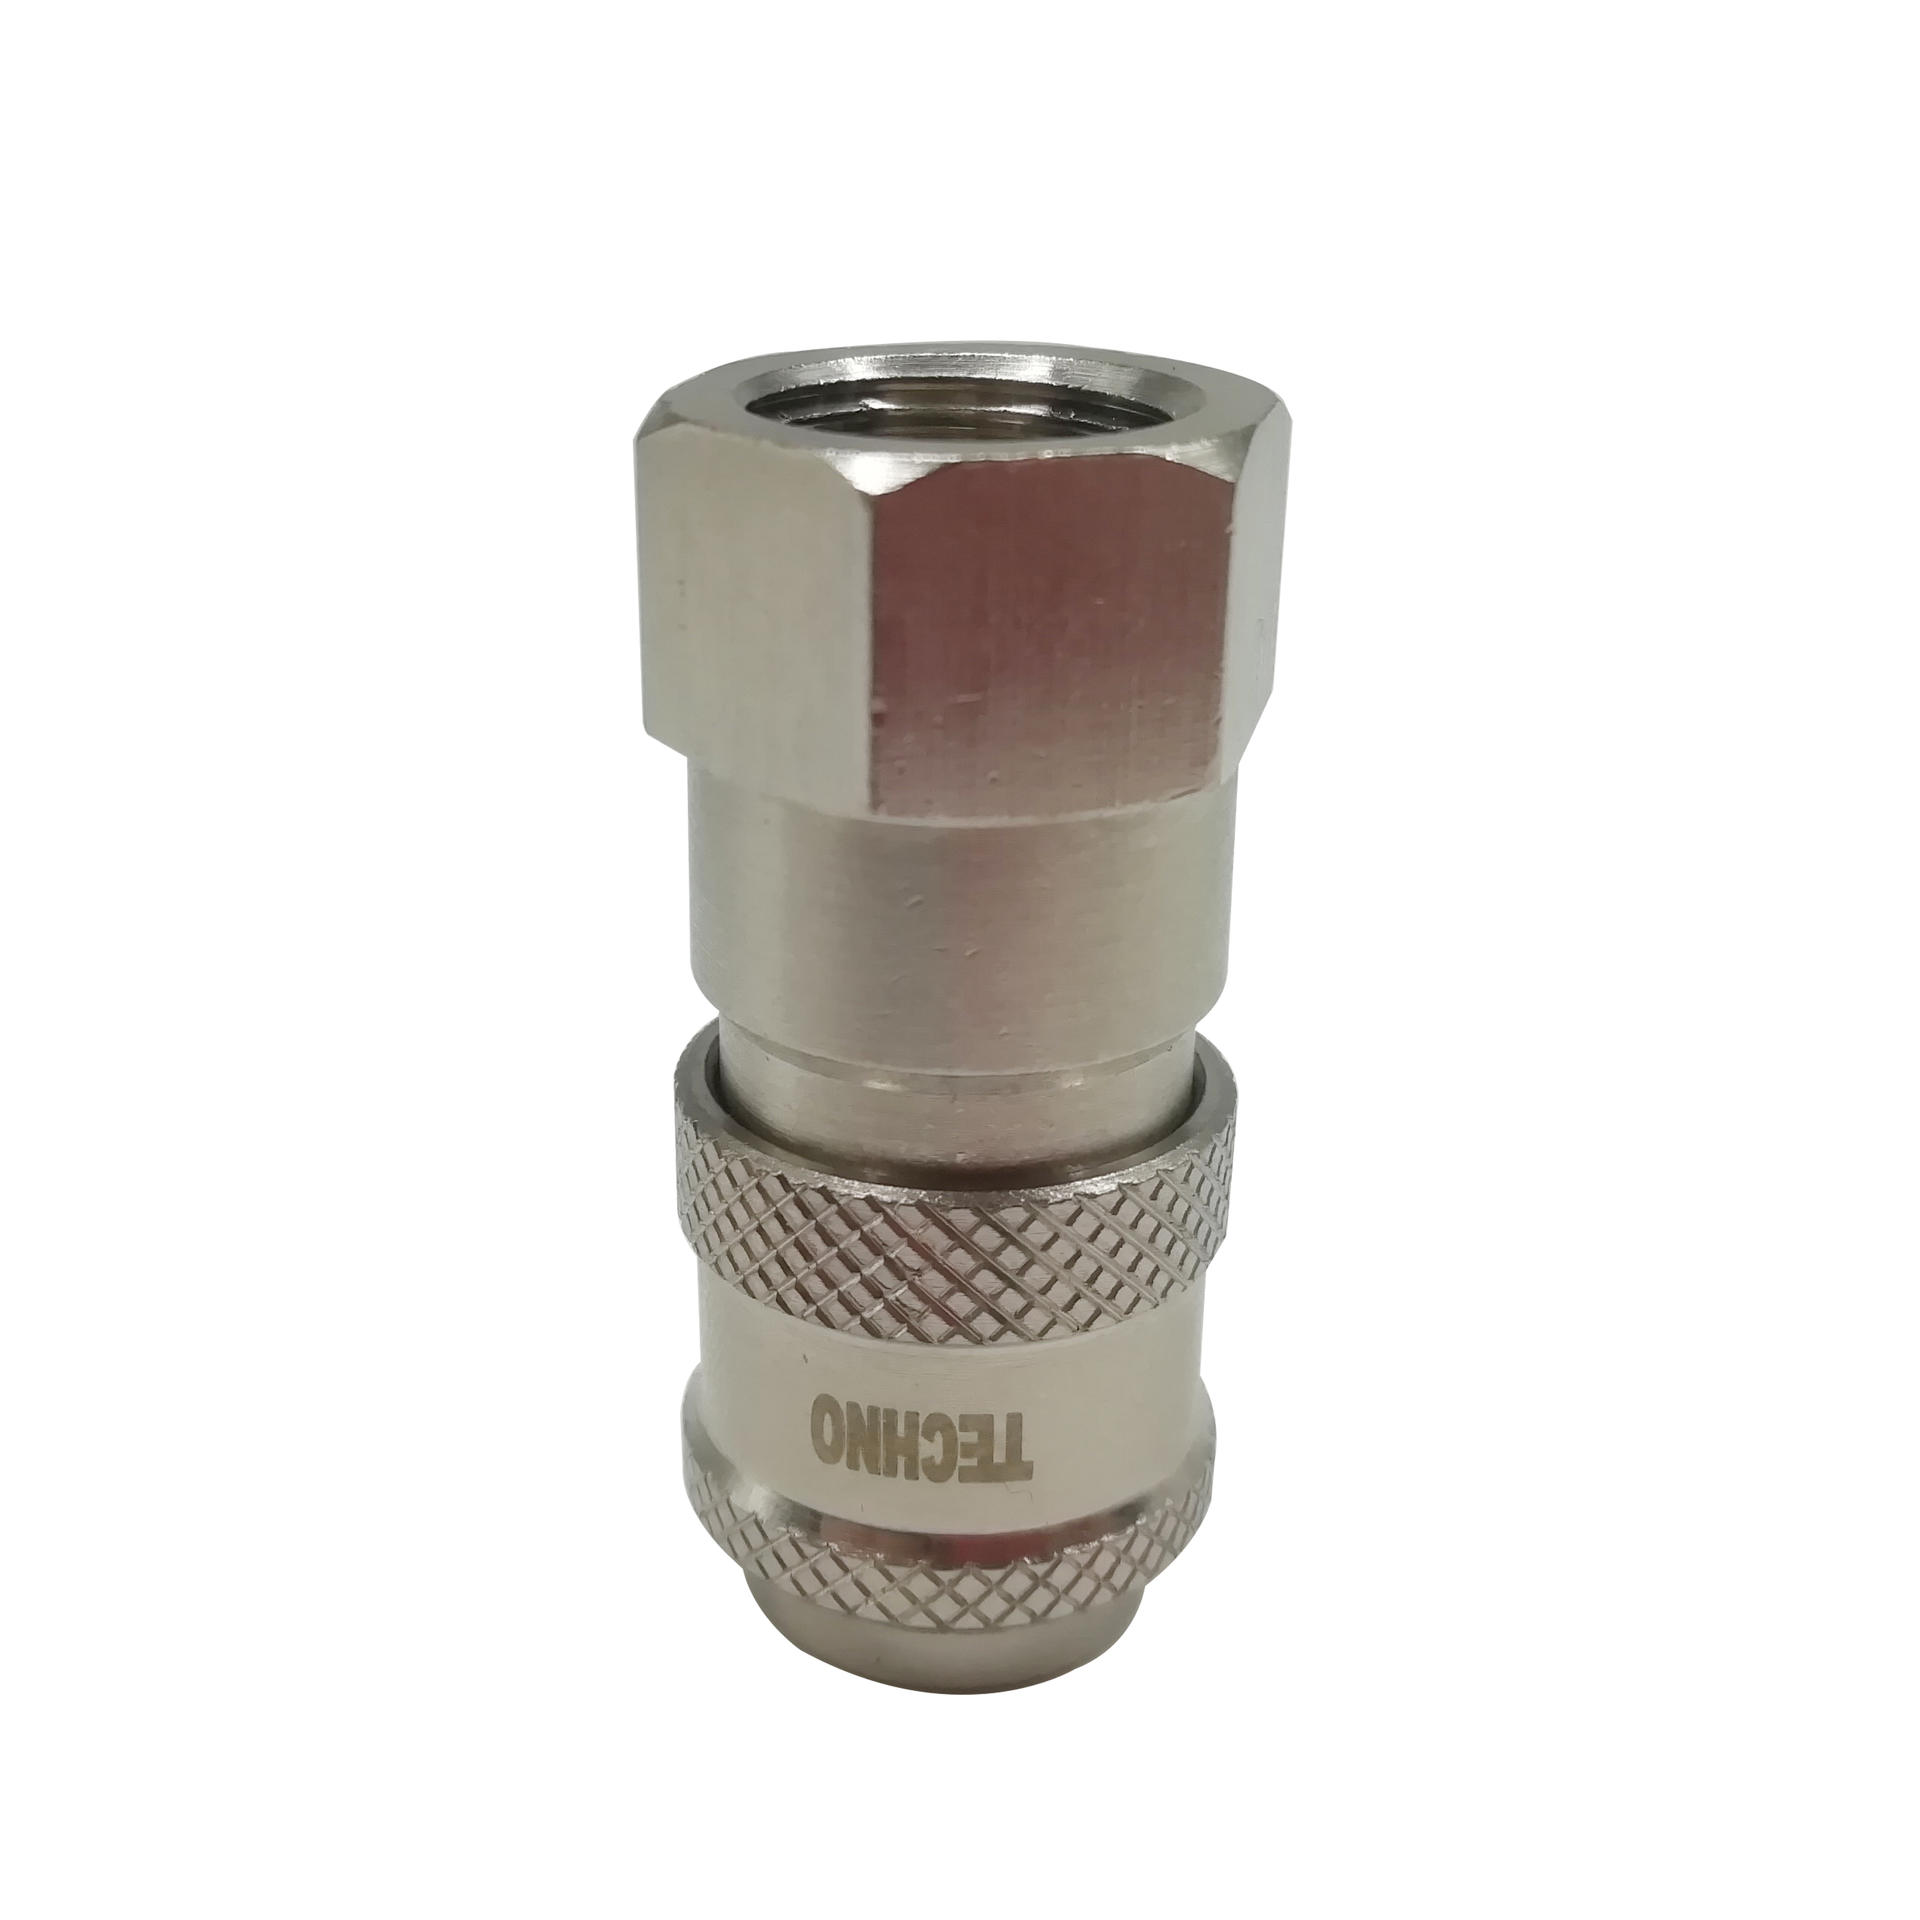 Brass Self Locking Mini Coupler TZS-SF1/8 TZS-SF1/2 Pneumatic Euro Type Female SocketCoupler